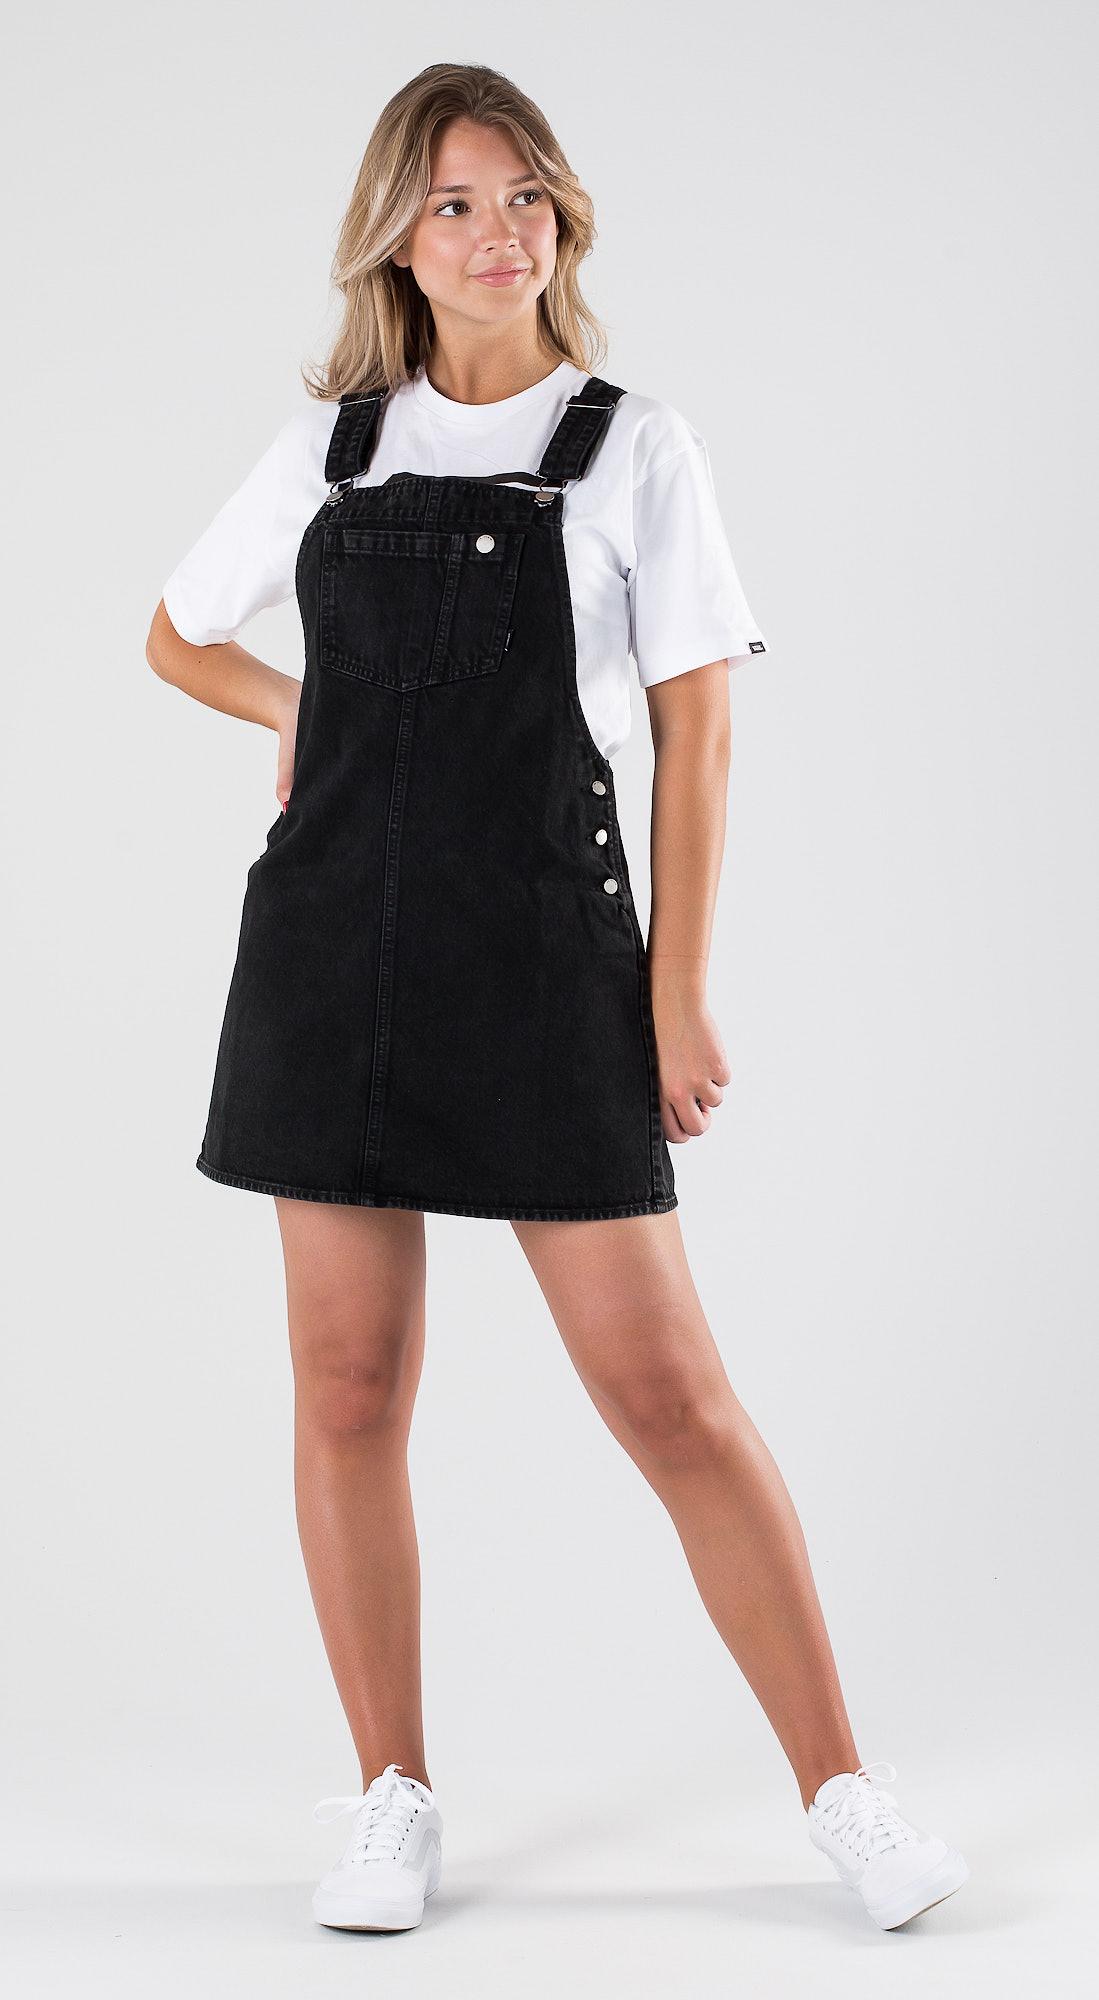 796b2561e453 Dr Denim Eir Dungaree Dress Summer Camp Black Outfit - Ridestore